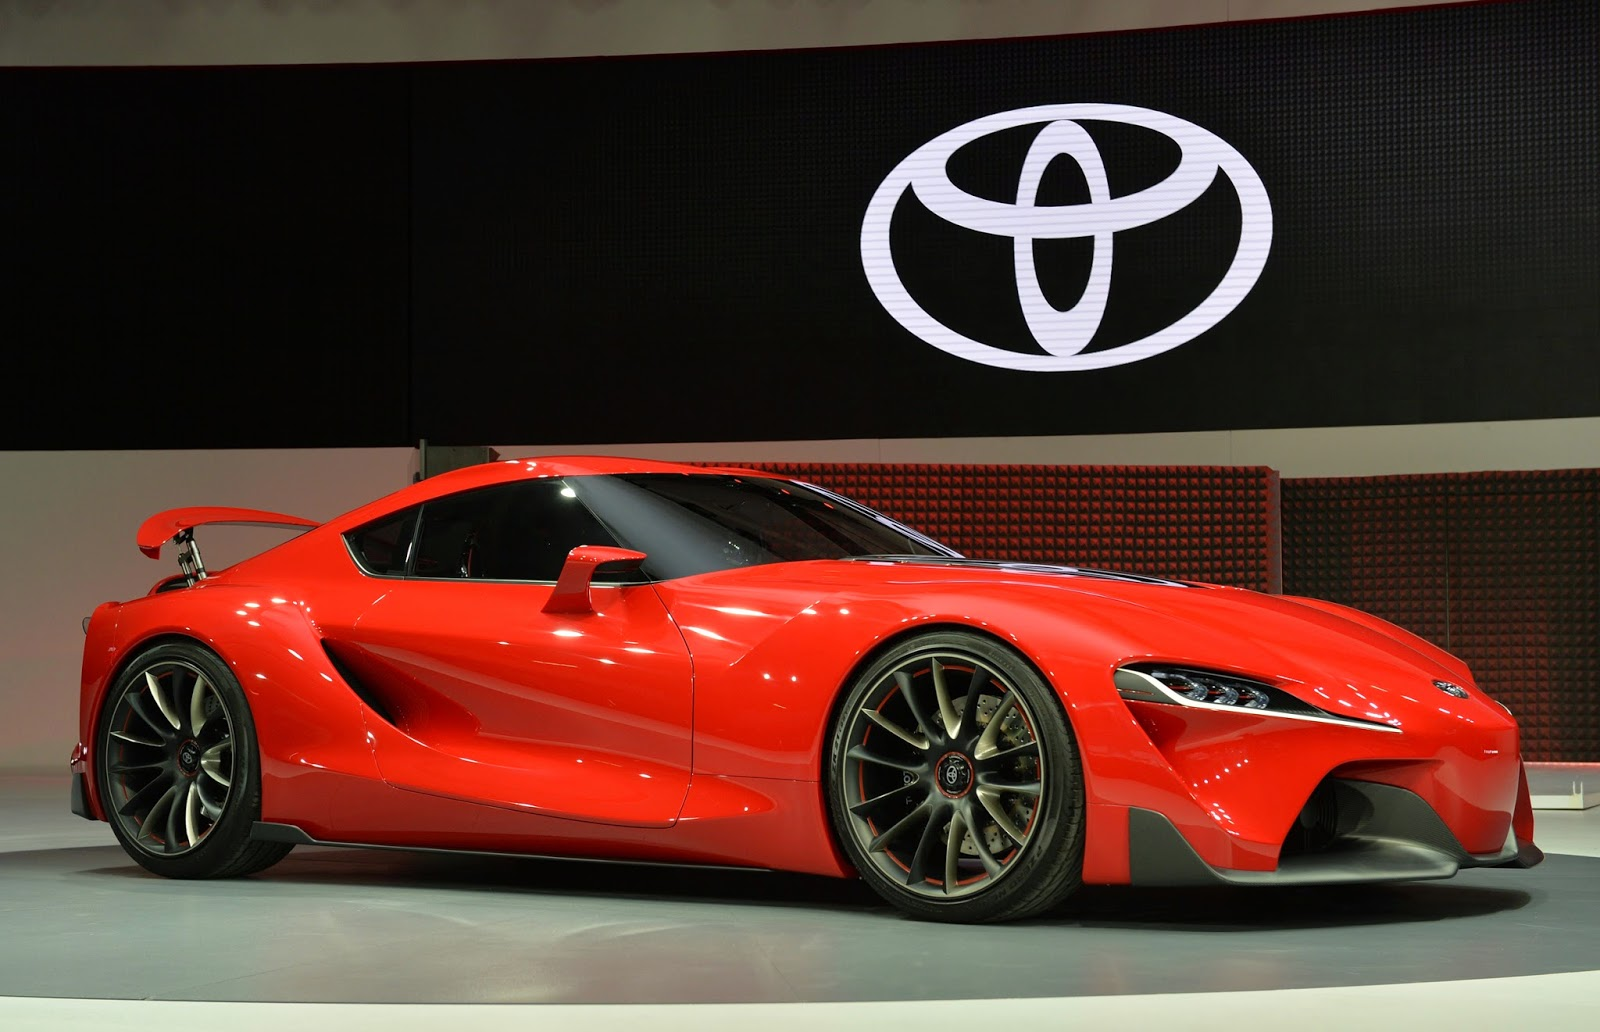 2017 Toyota Supra >> Nostalgia Bersama Toyota Supra Thegaspol Com